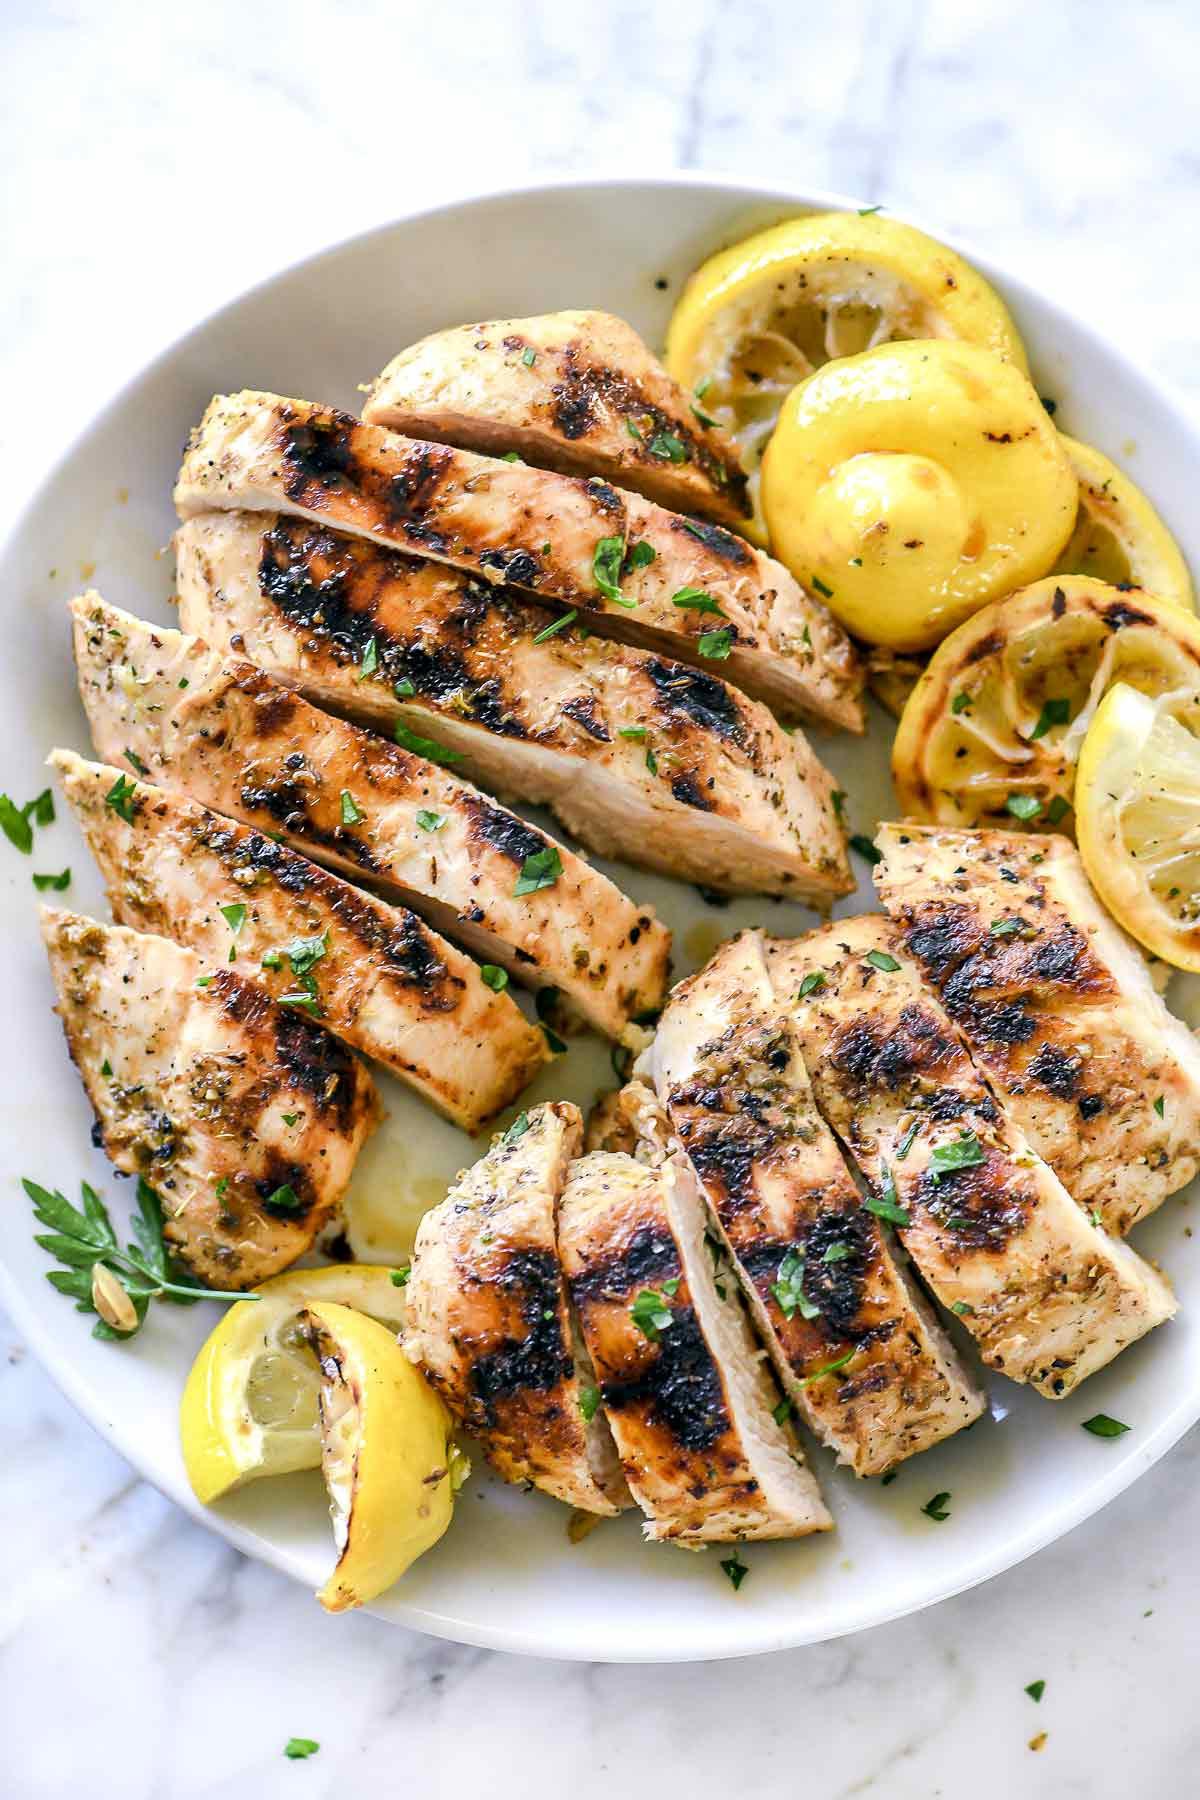 وصفات عشاء للرجيم - - دجاج مشوي بالليمون